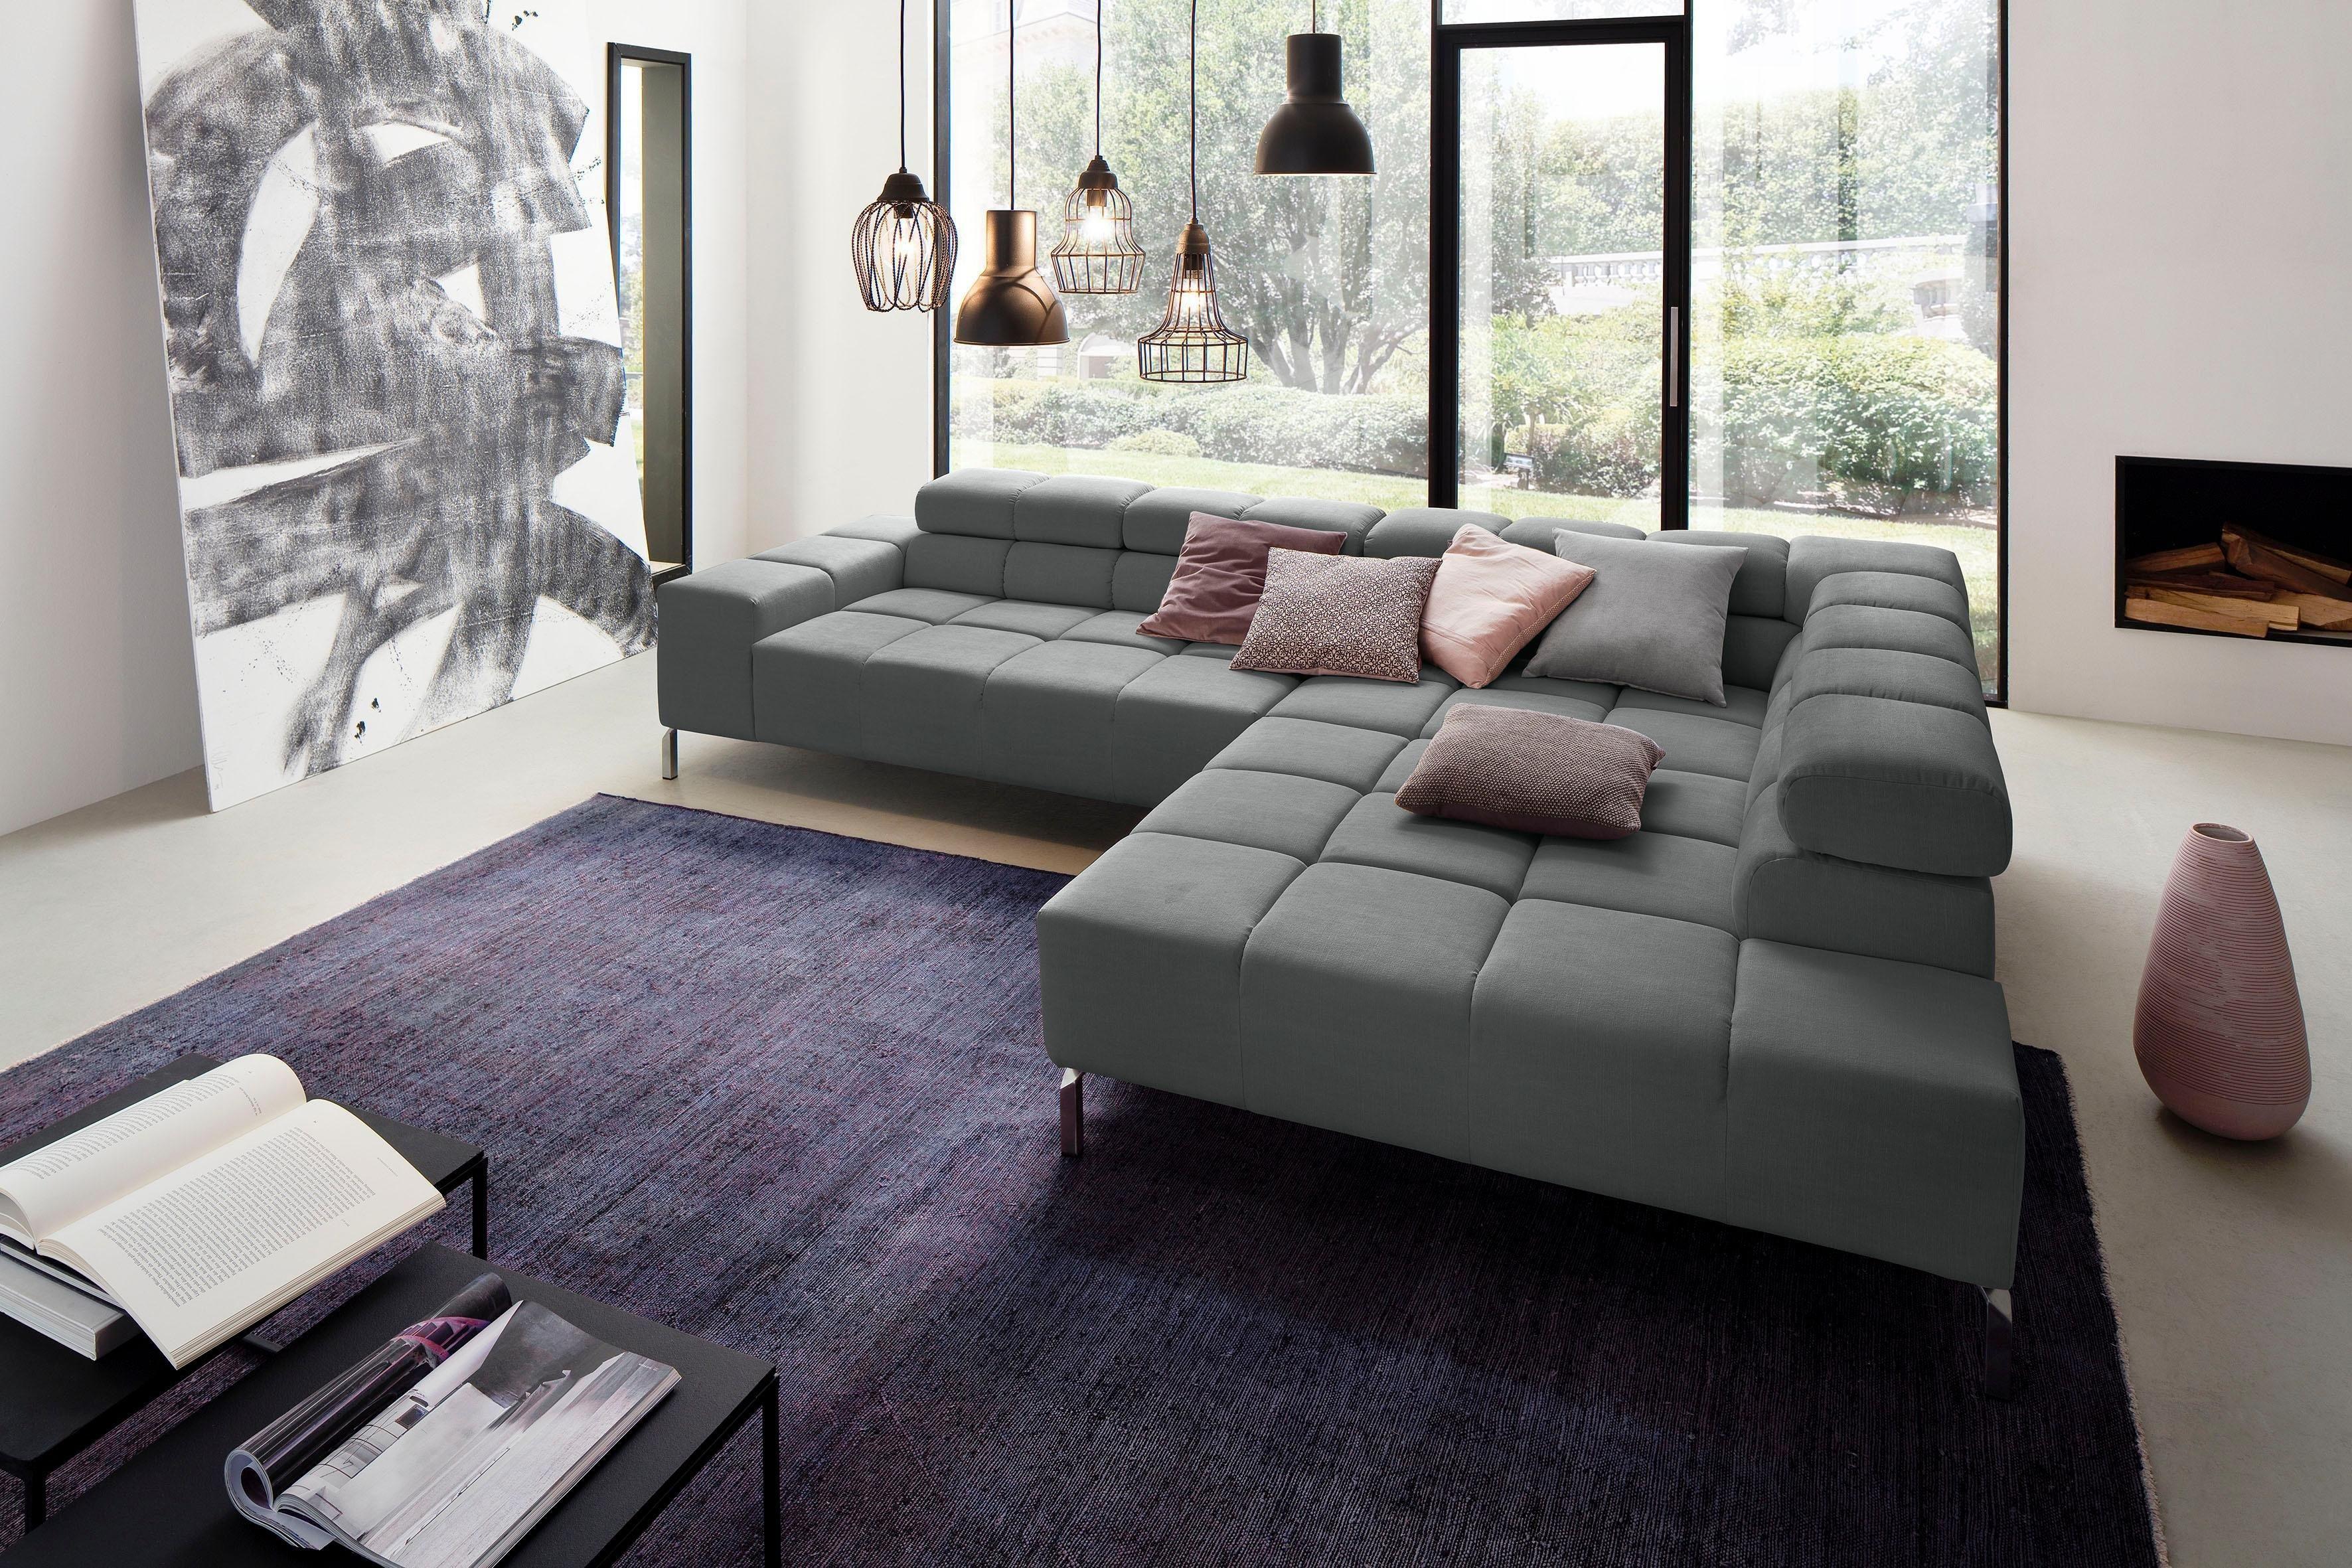 Places Of Style Ecksofa Turin In 2020 Ecksofas Ecksofa Recamiere